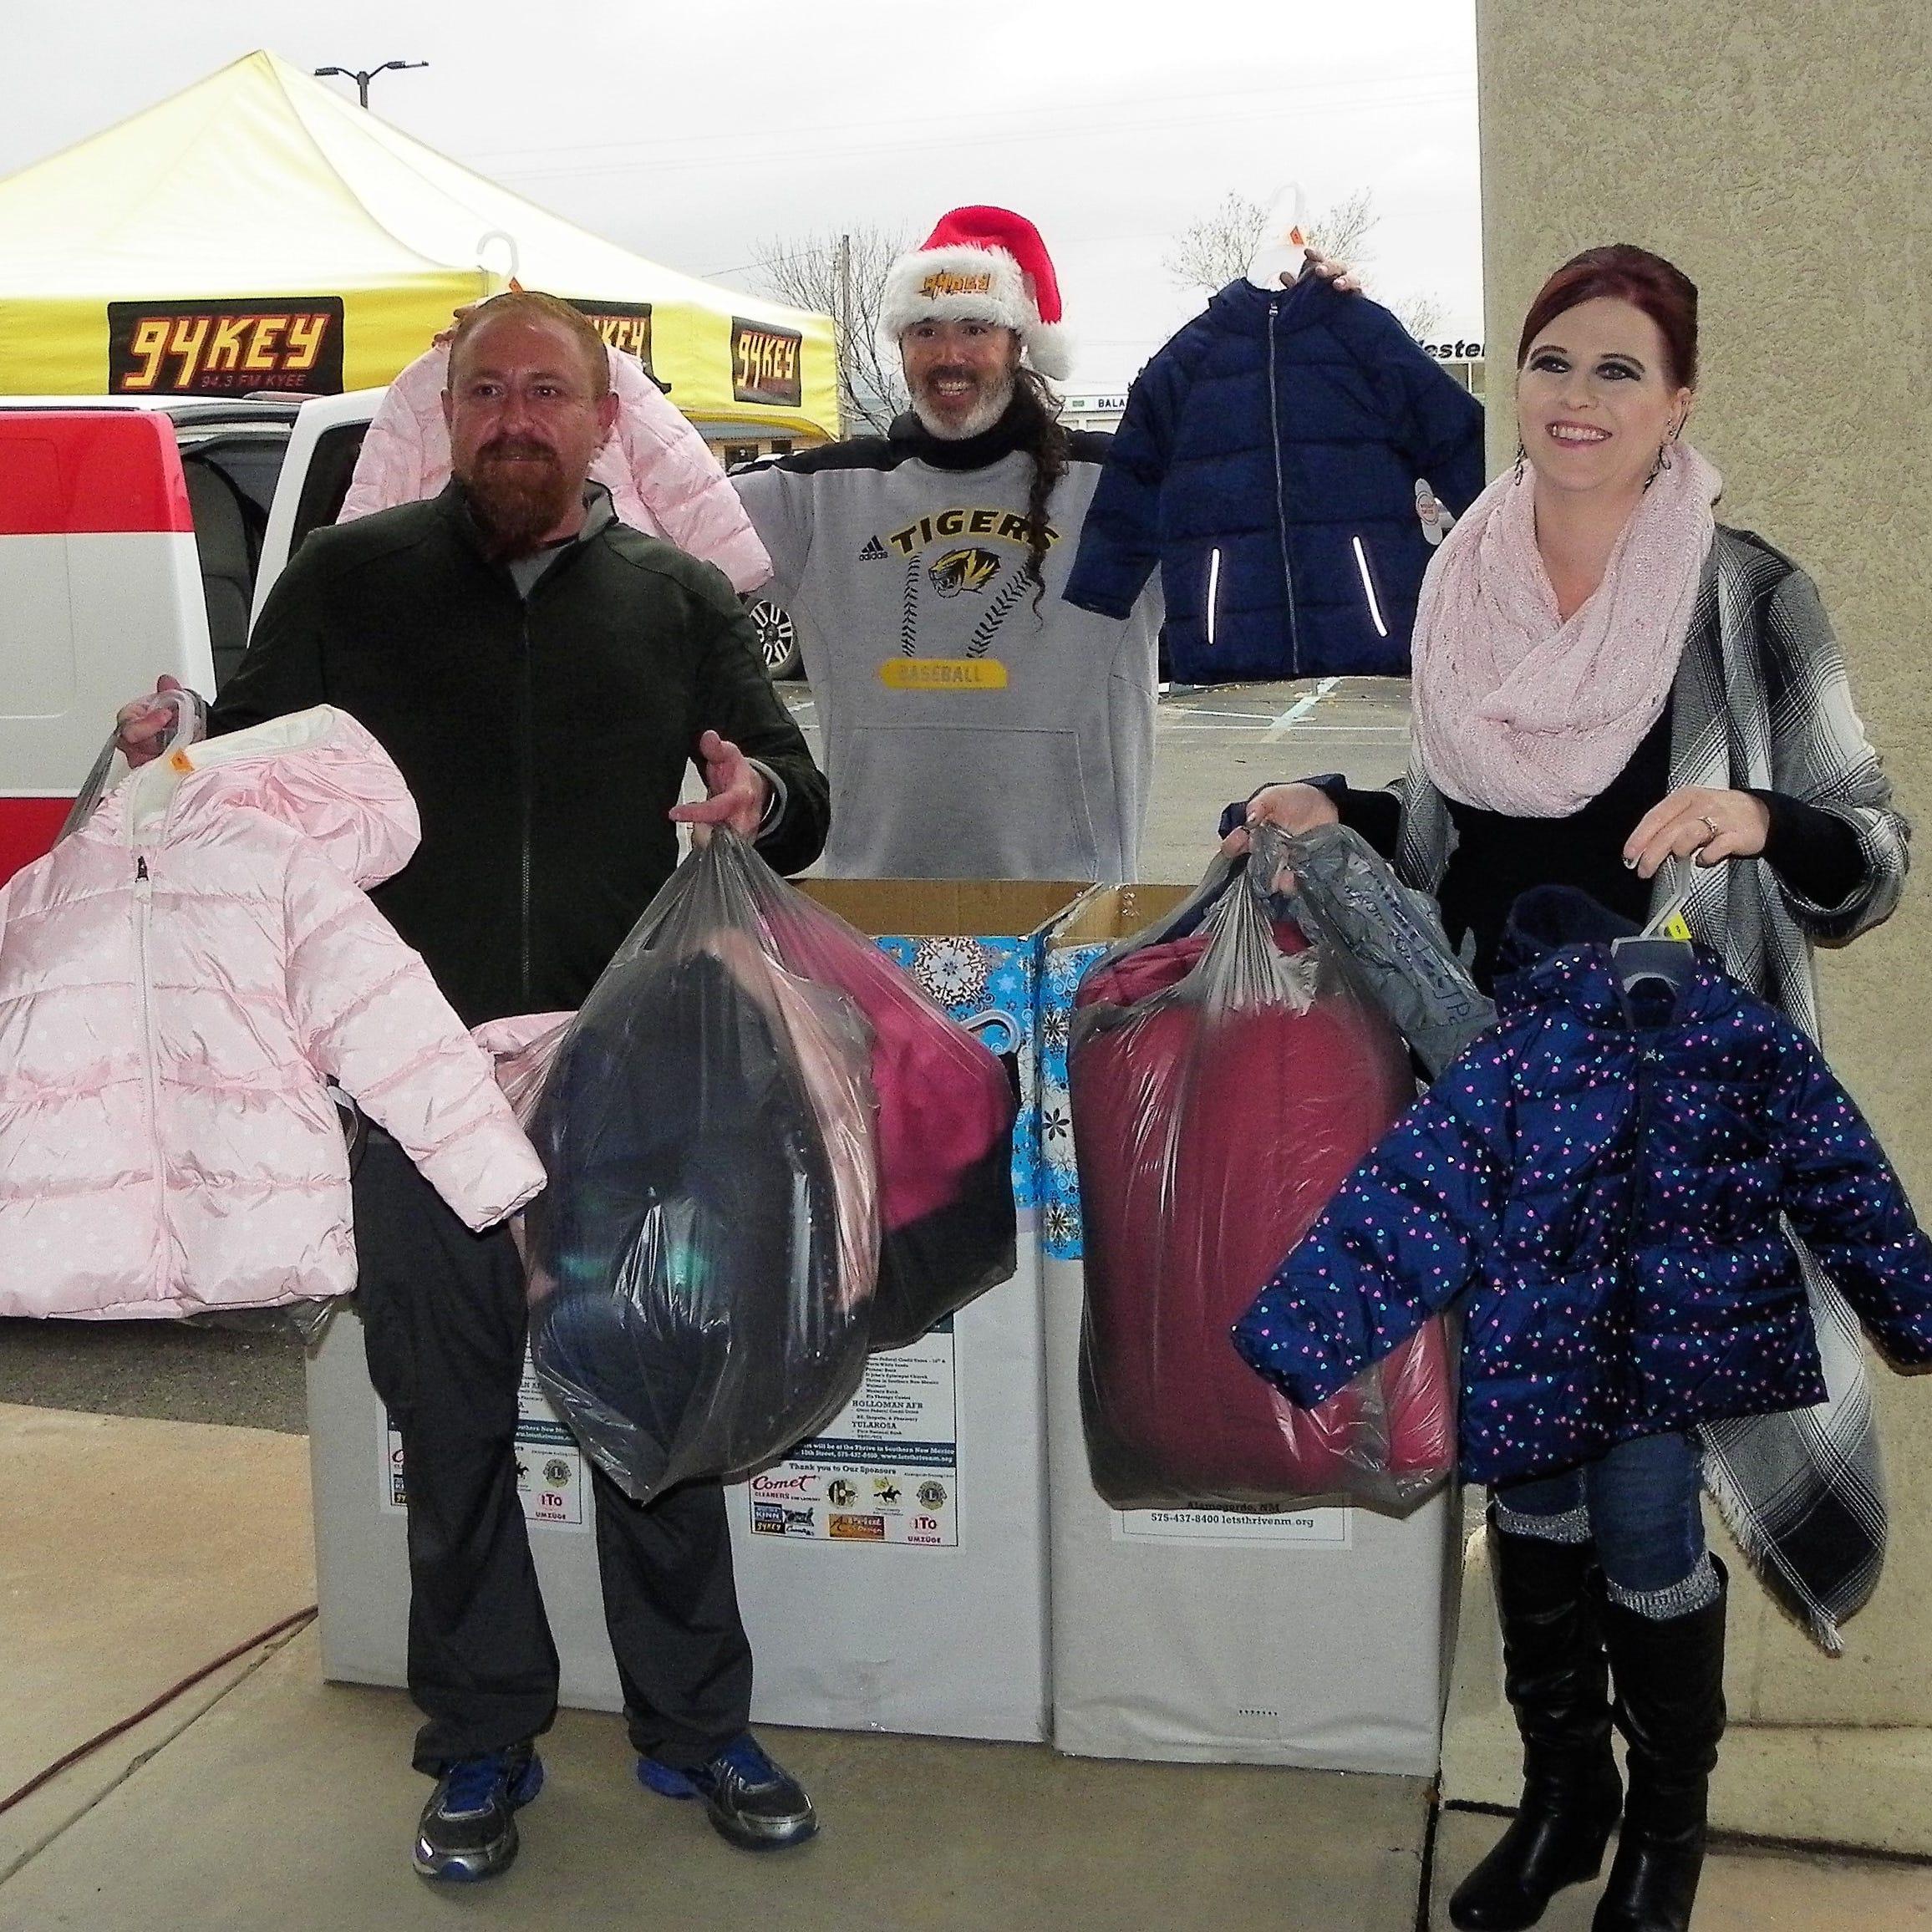 Alamogordo's Thrive collecting Koats for Kids